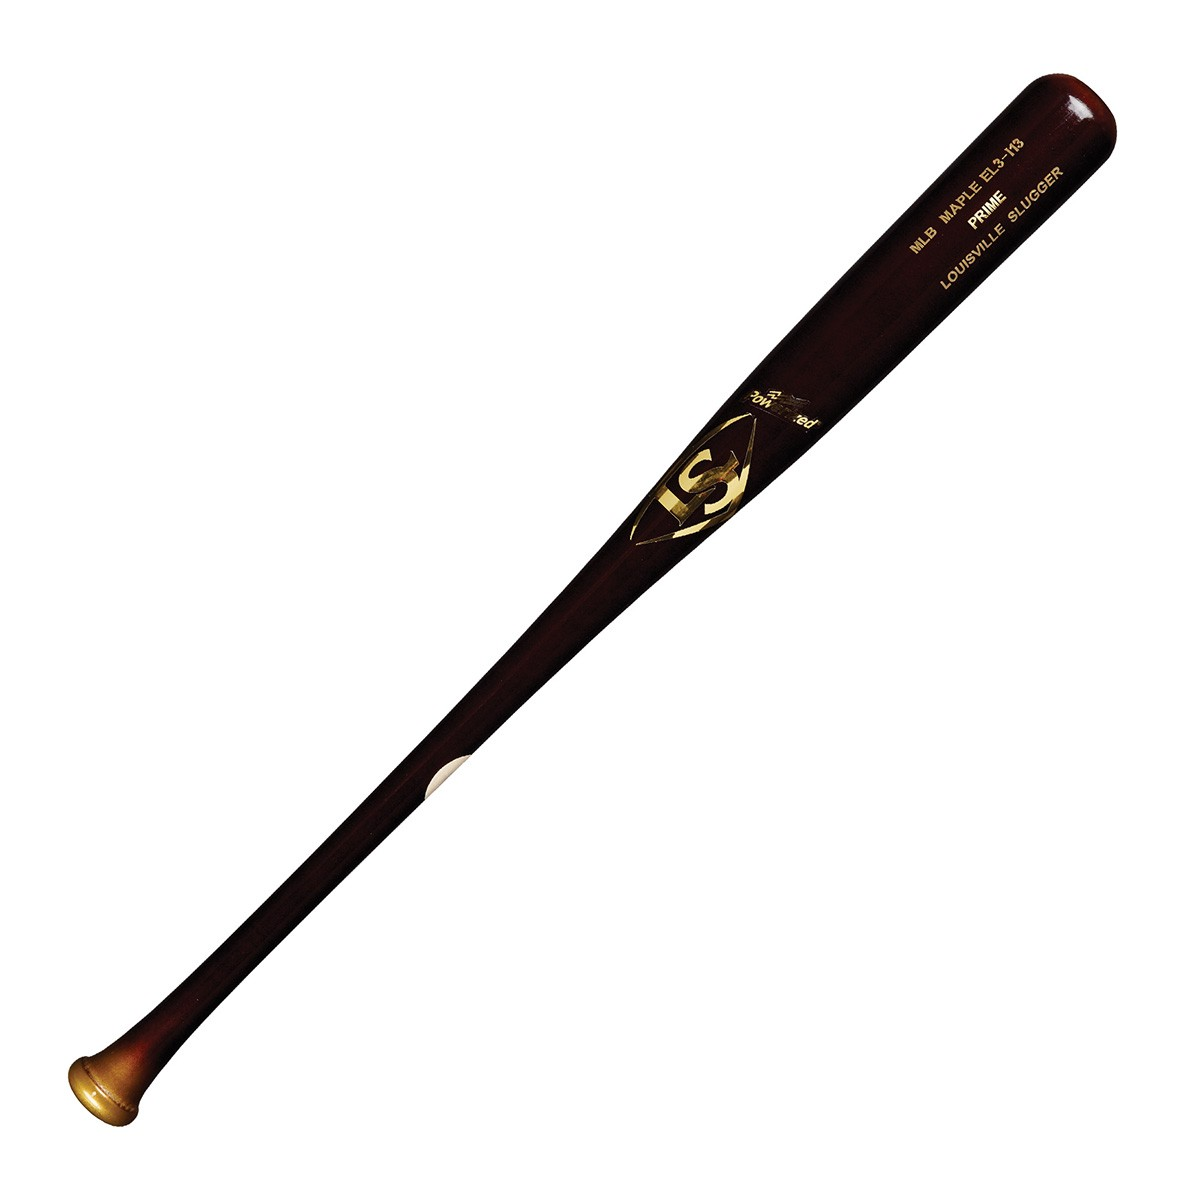 1200x1200 Mlb Prime Maple El3 I13 Hickory Baseball Bat Louisville Slugger